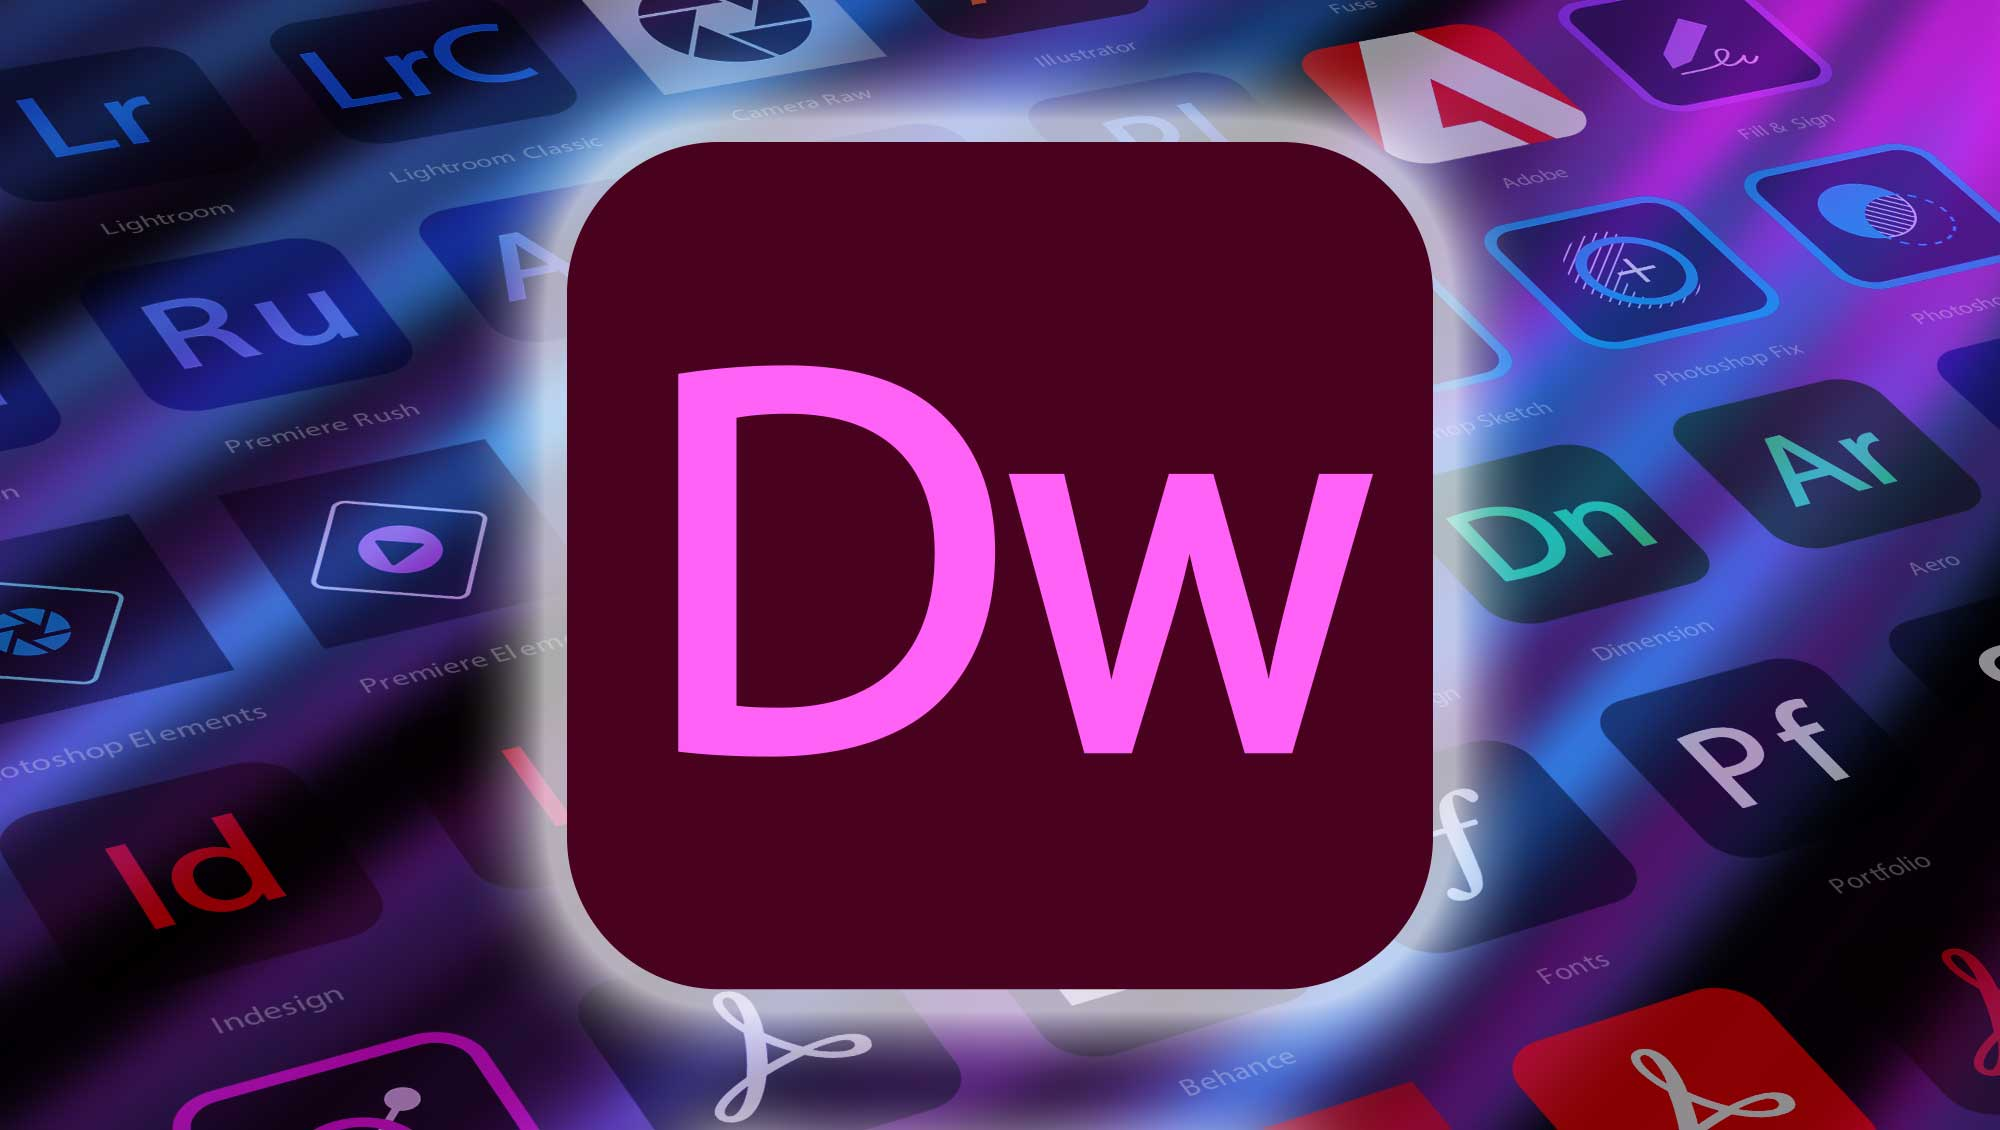 Adobe CC(Adobe Crative Cloud)ソフトウェア